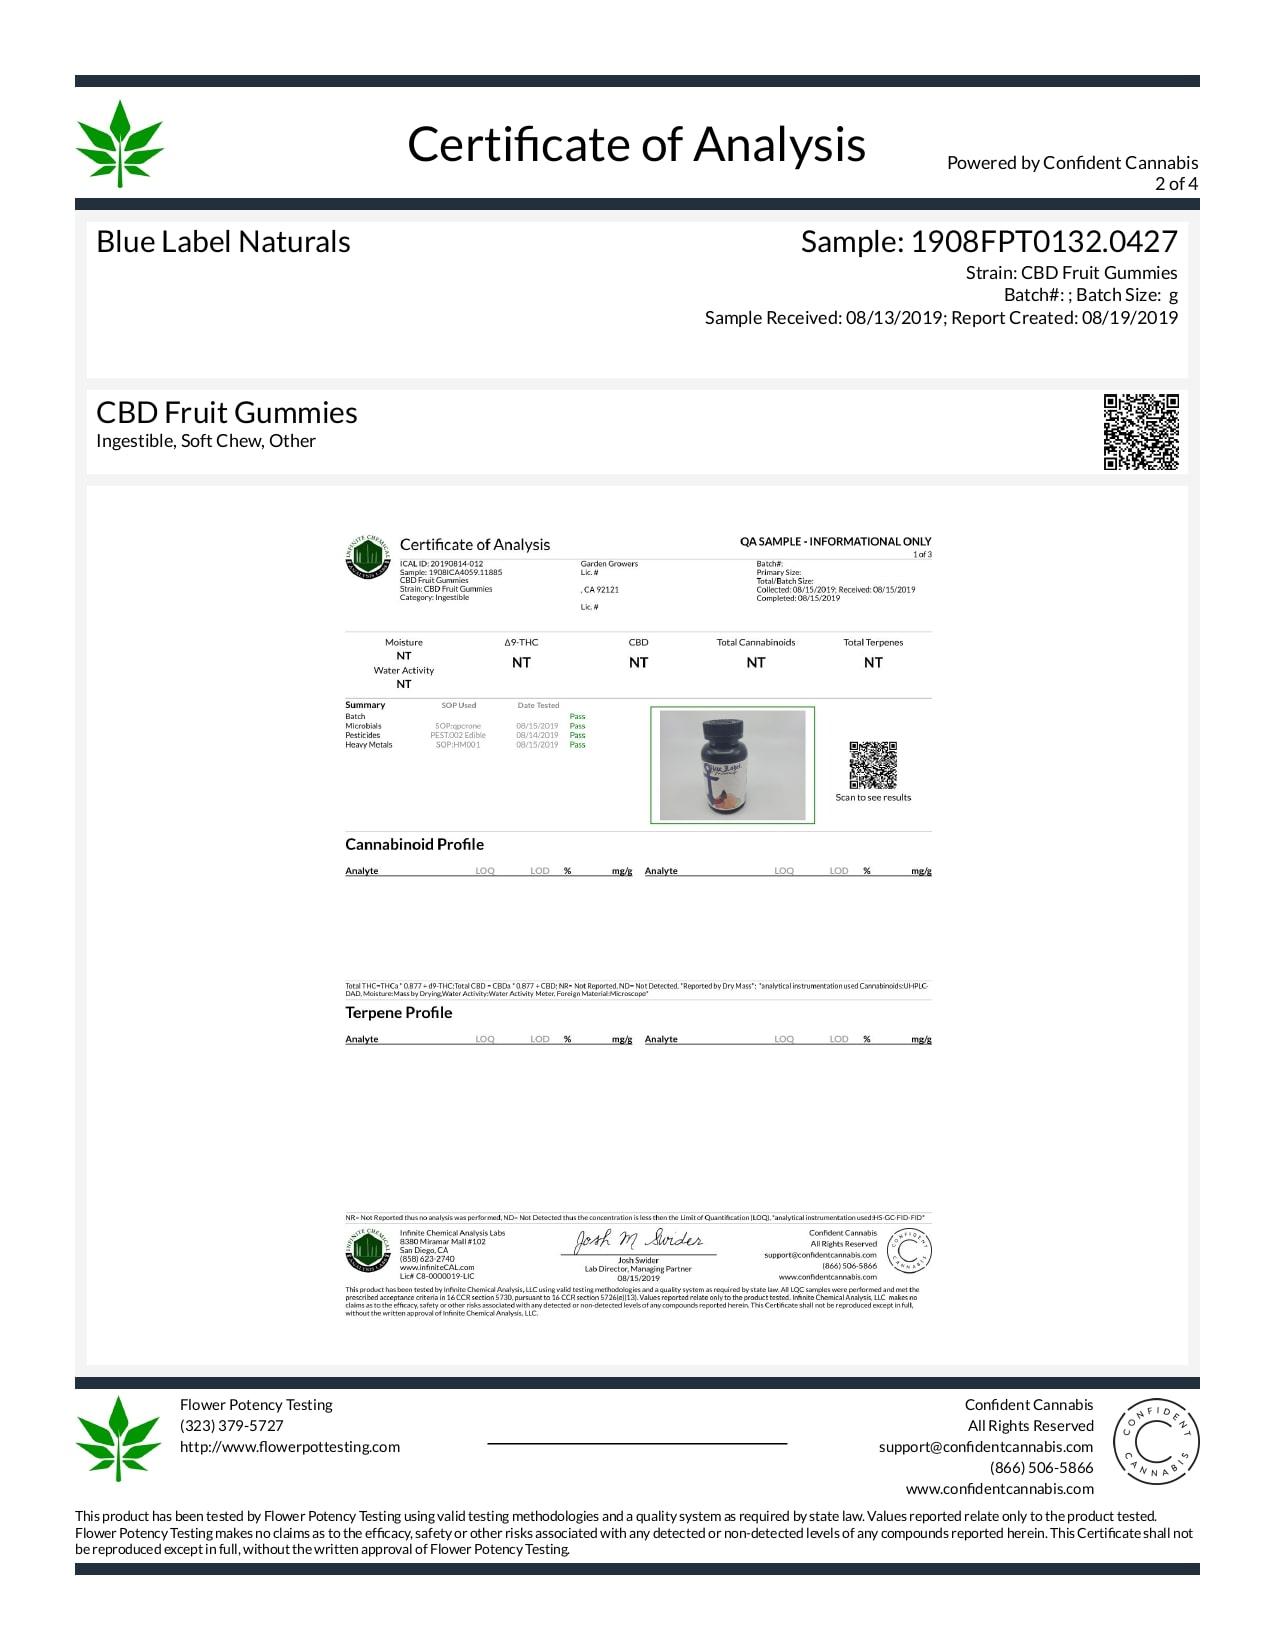 Blue Label CBD Edible Gummies Lab Report